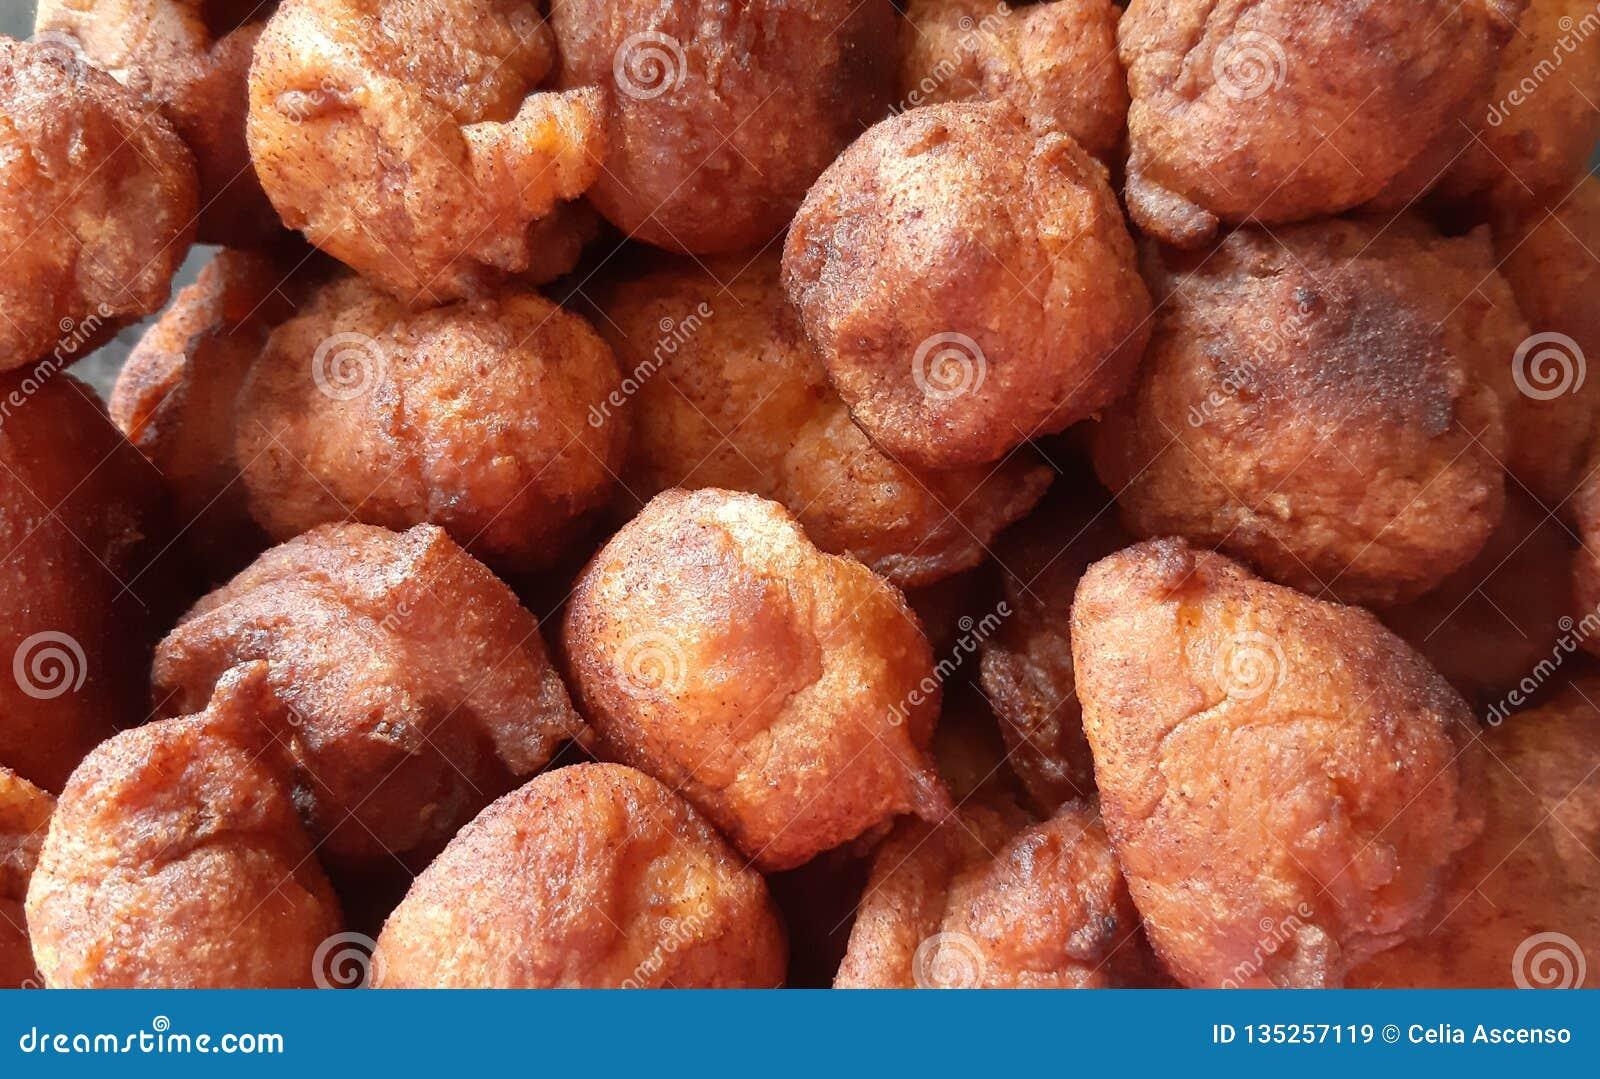 Filhos Christmas Portuguese Cookies Stock Image Image Of Cinnamon